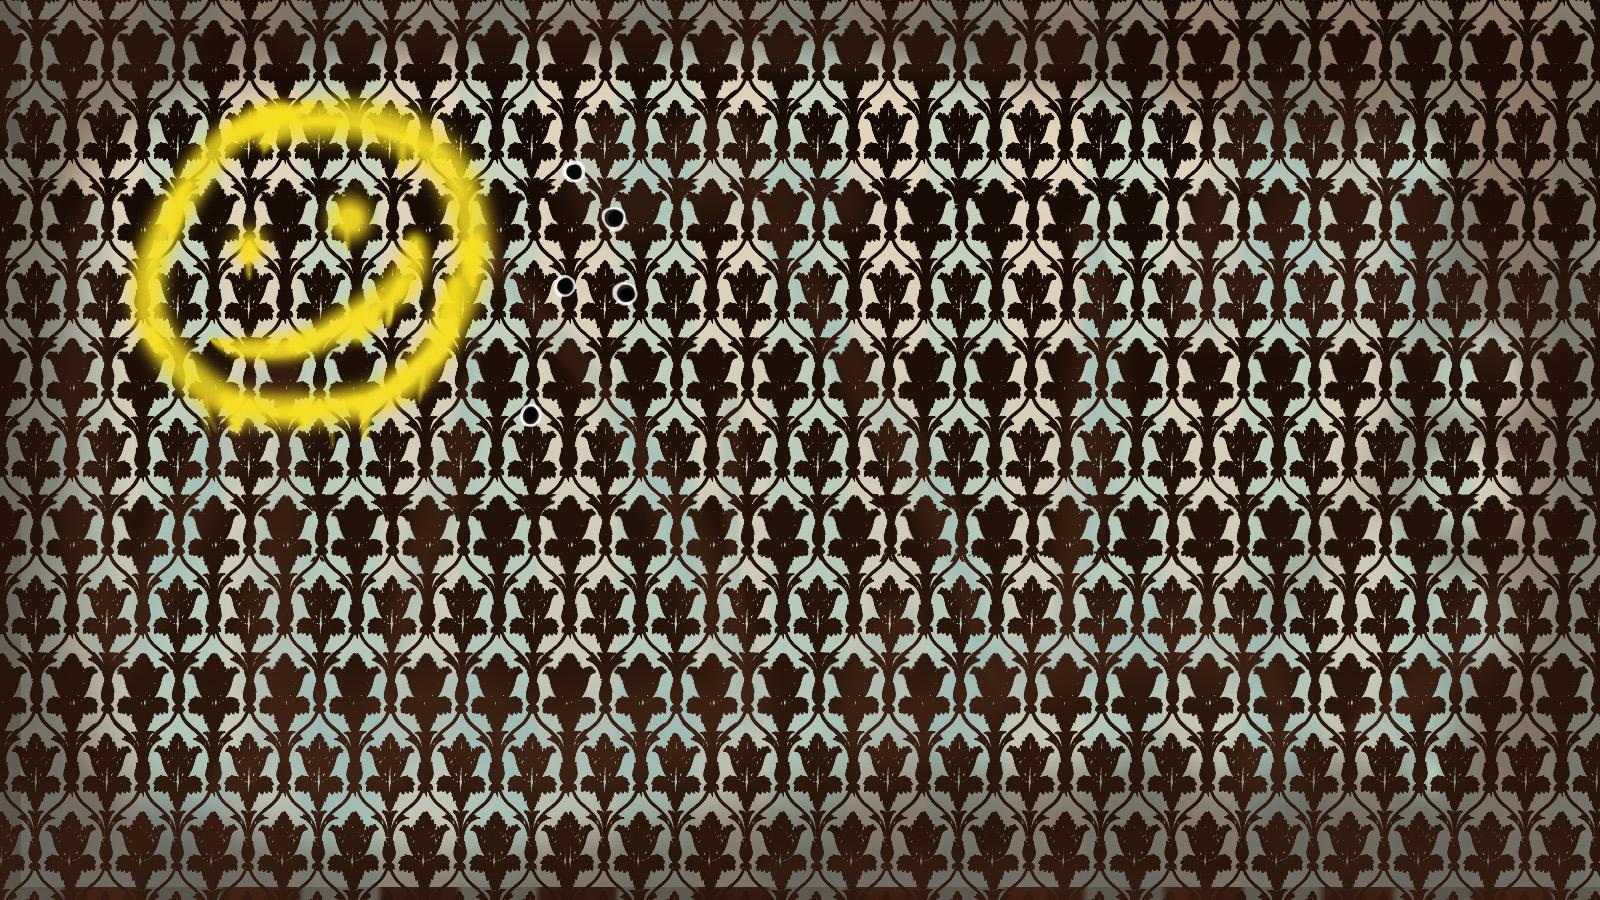 Sherlock wallpaper sherlock on bbc one 33019561 1600 900jpg 1600x900